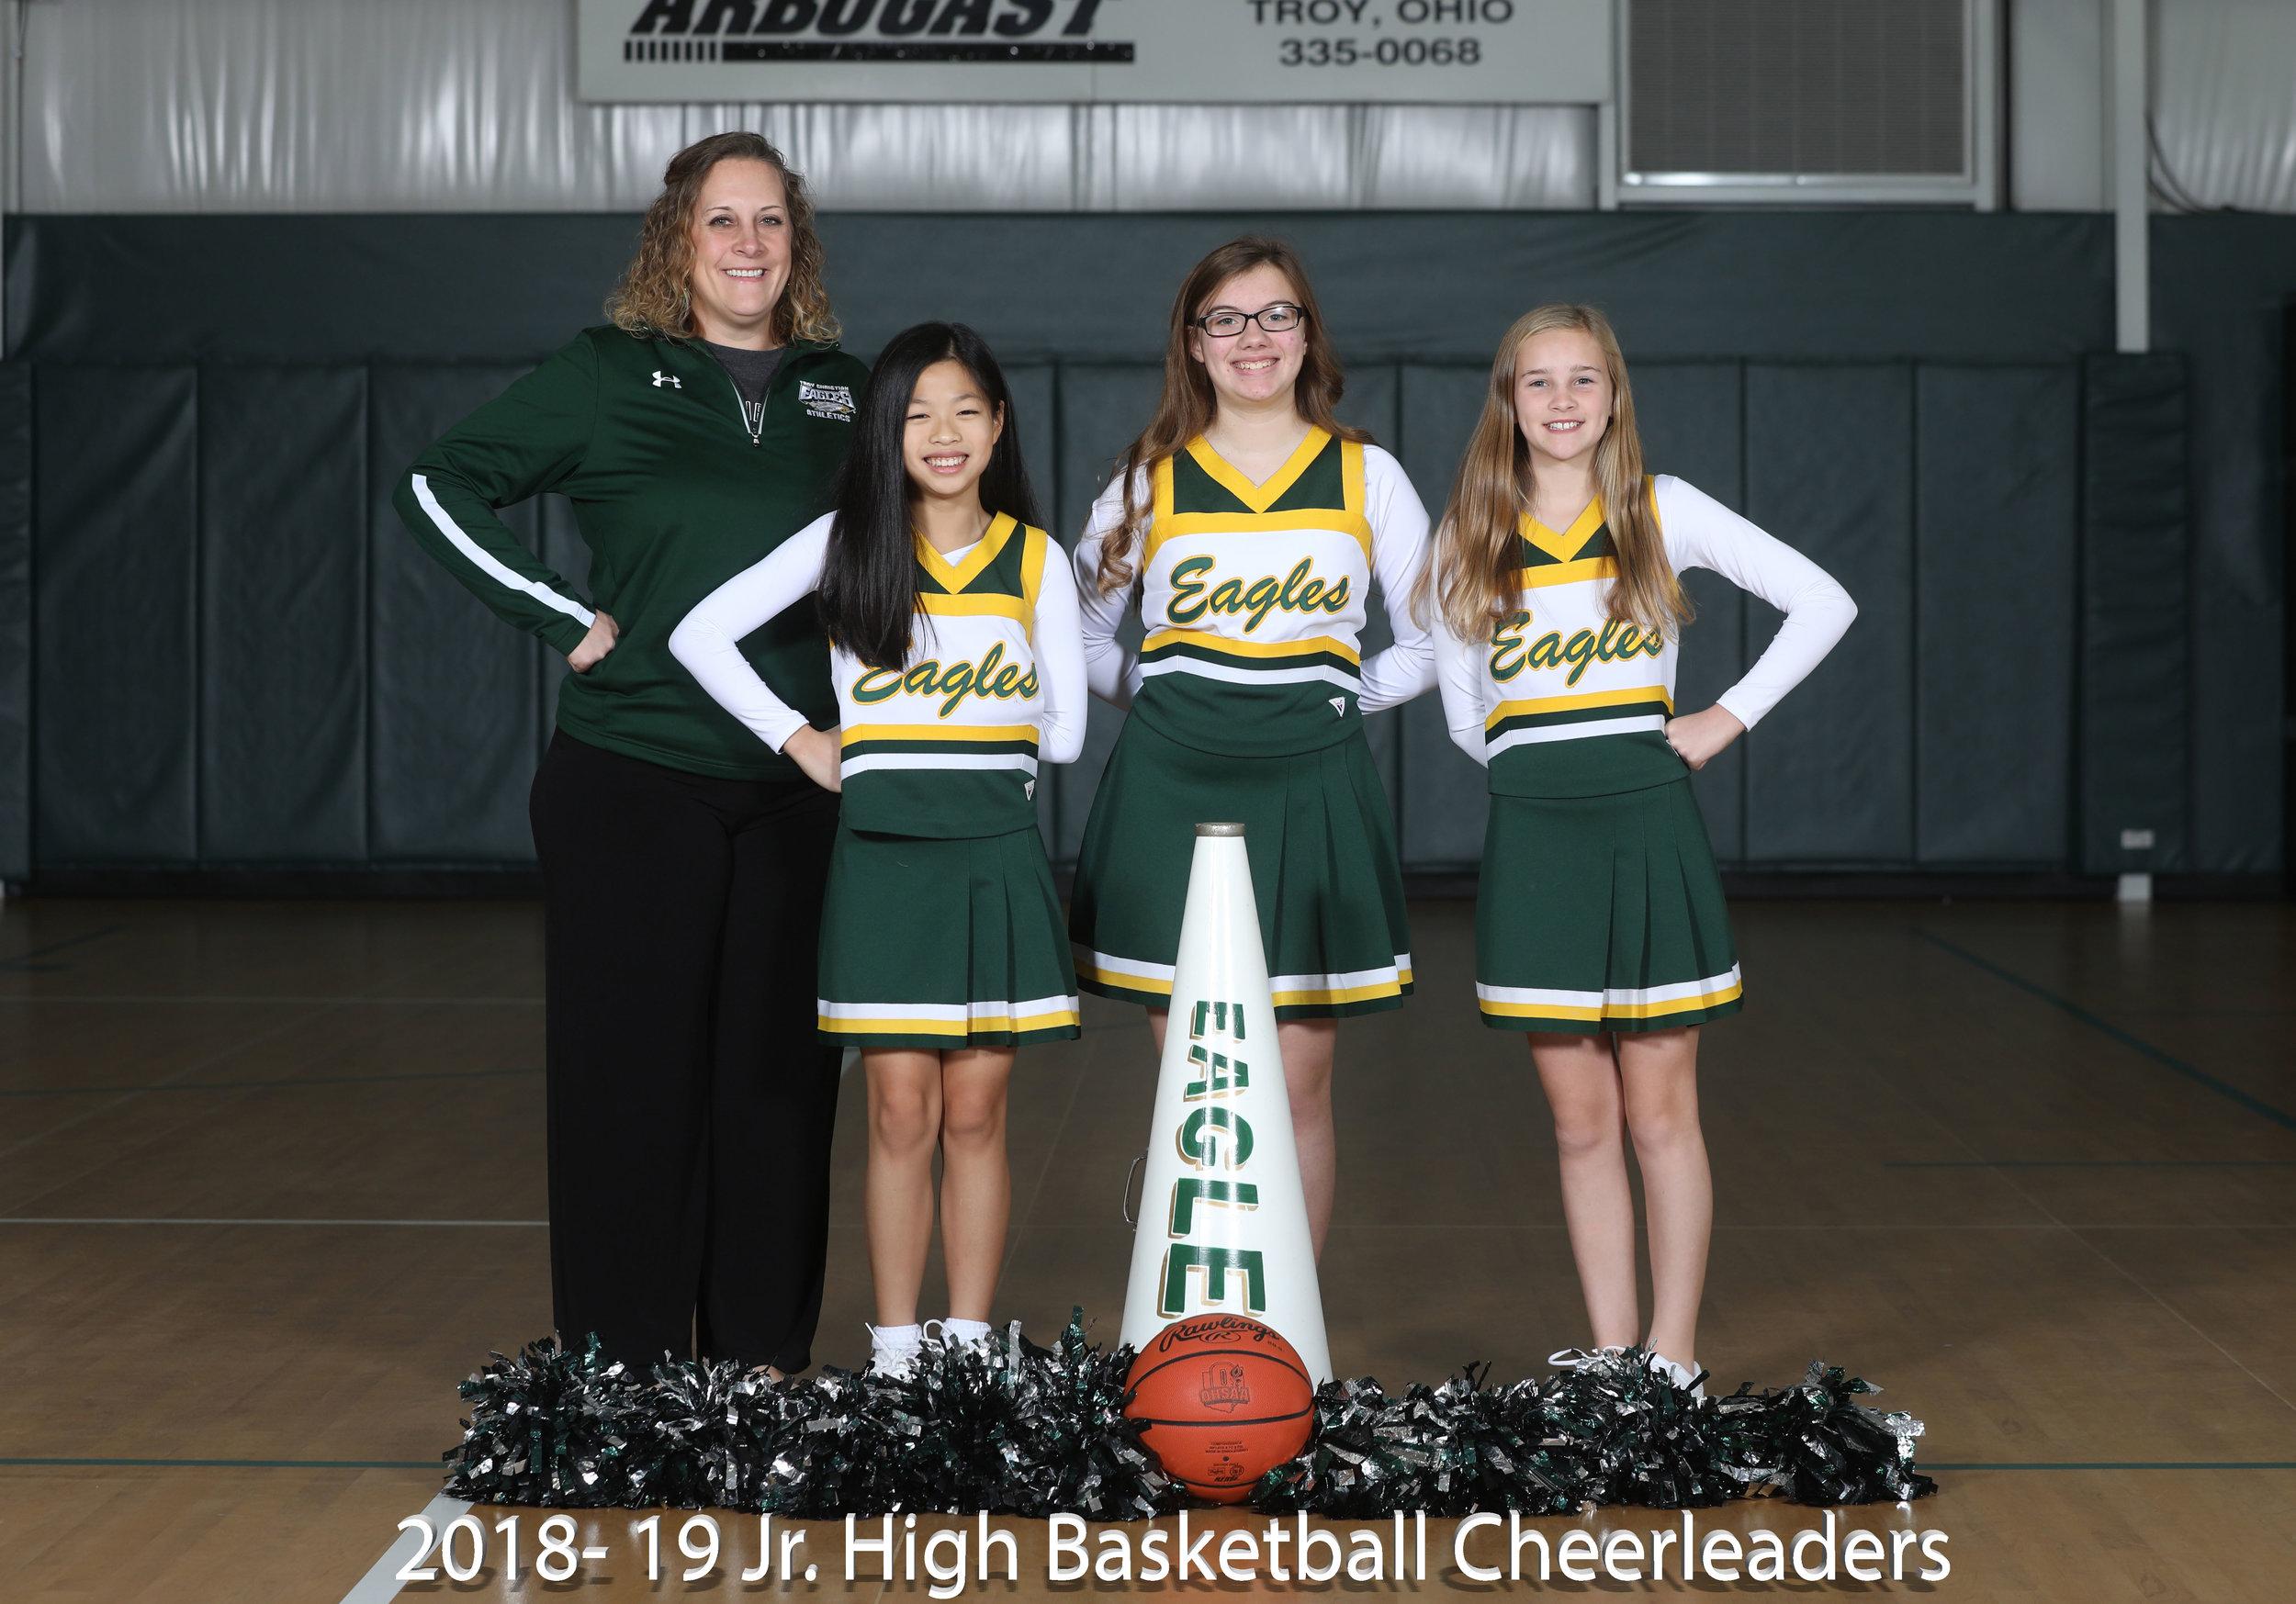 2017-18 Jr. High Basketball Cheerleaders